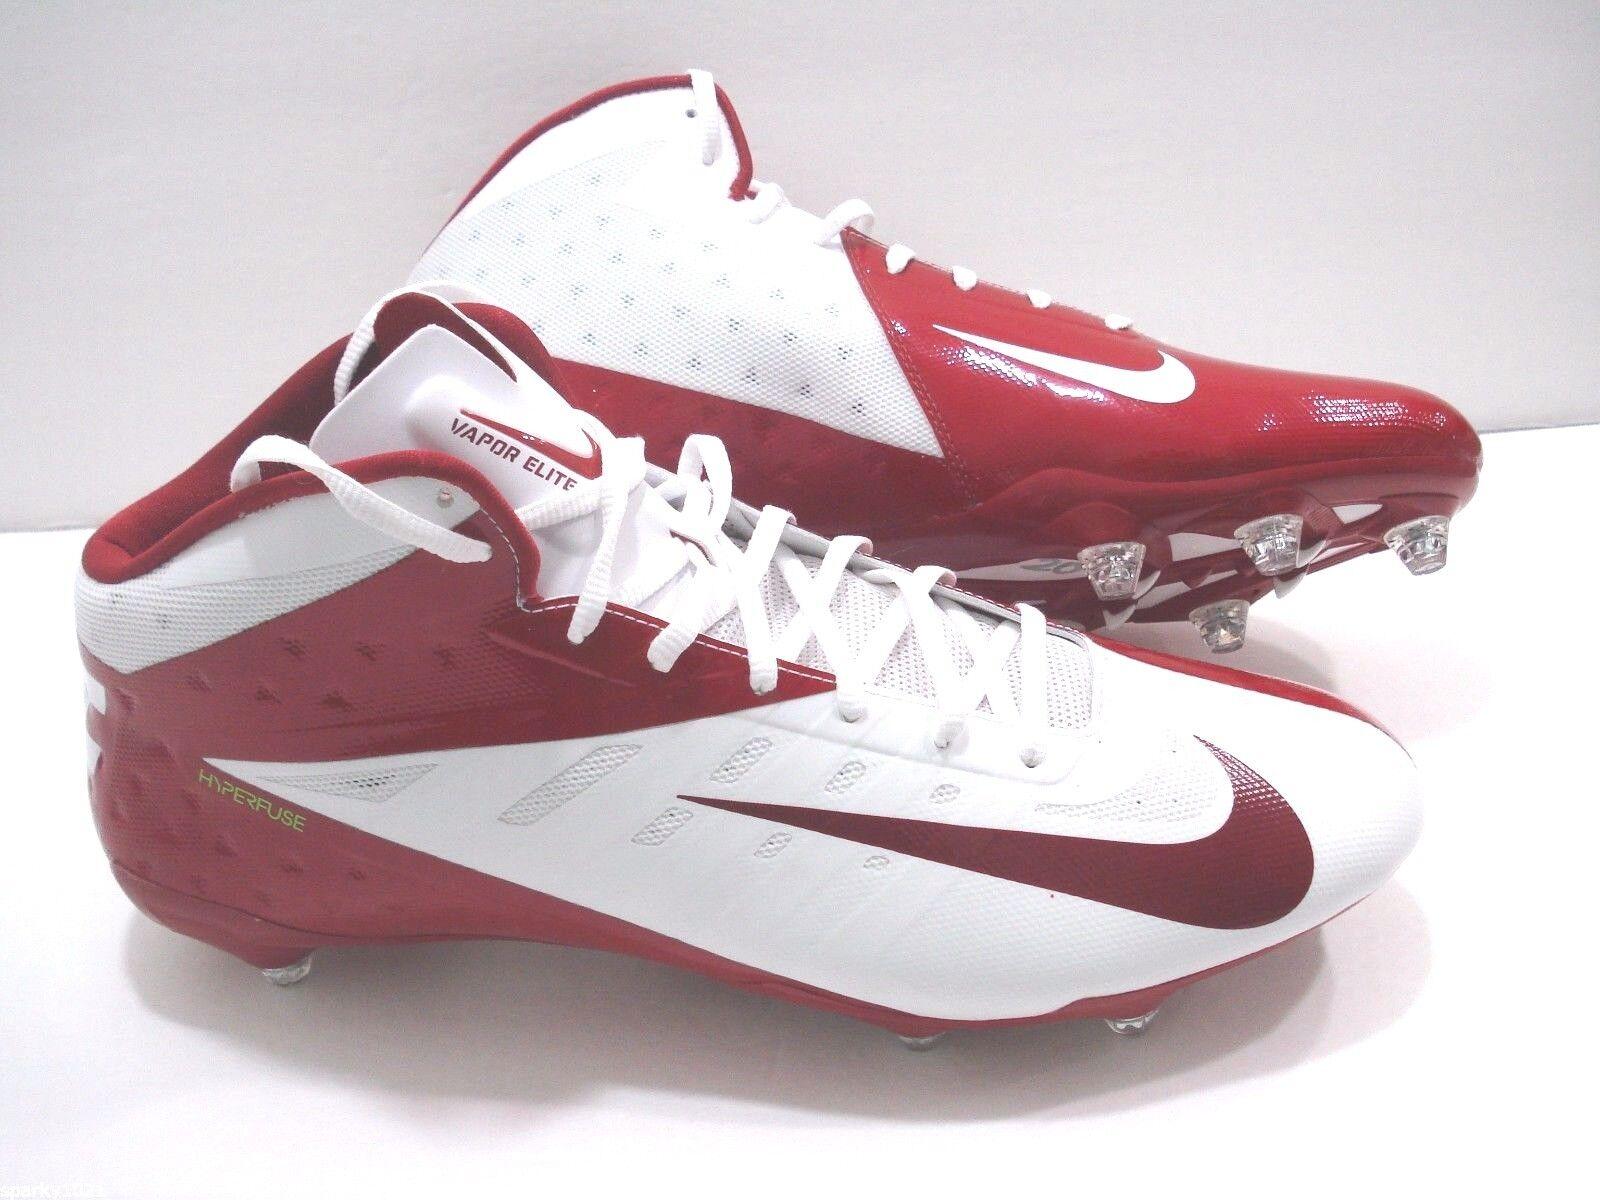 Nike Men's Vapor Talon Elite Pro Mid 3 4 D Football Cleats Size 16